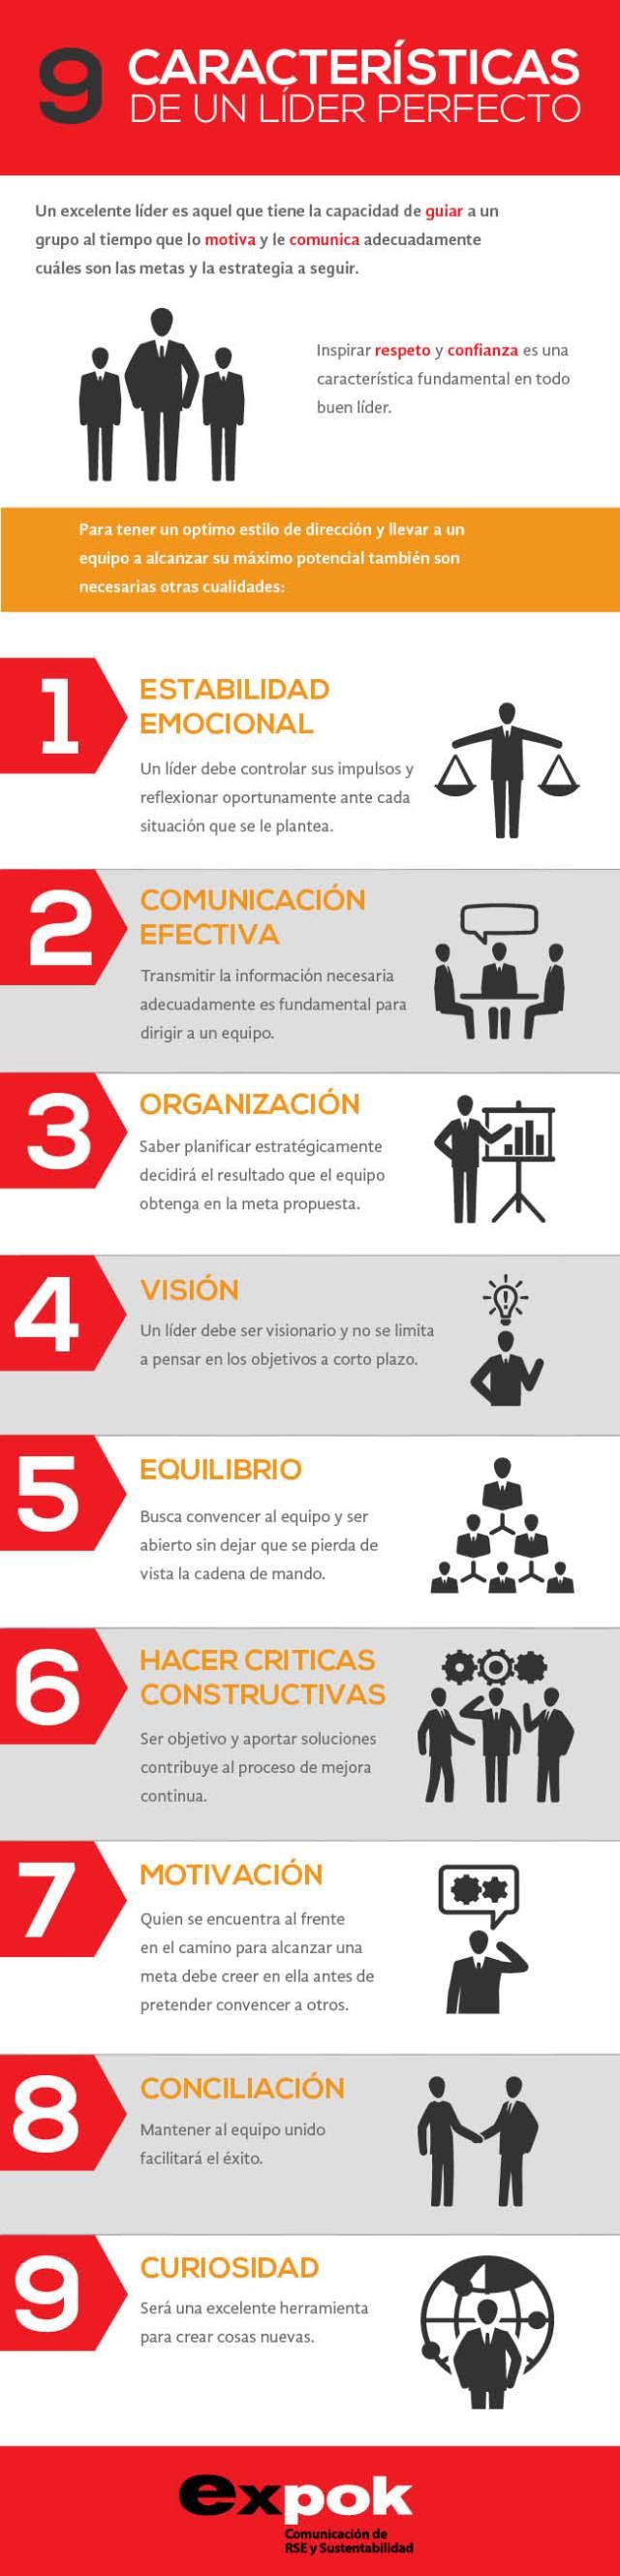 9 características deseables en un lider